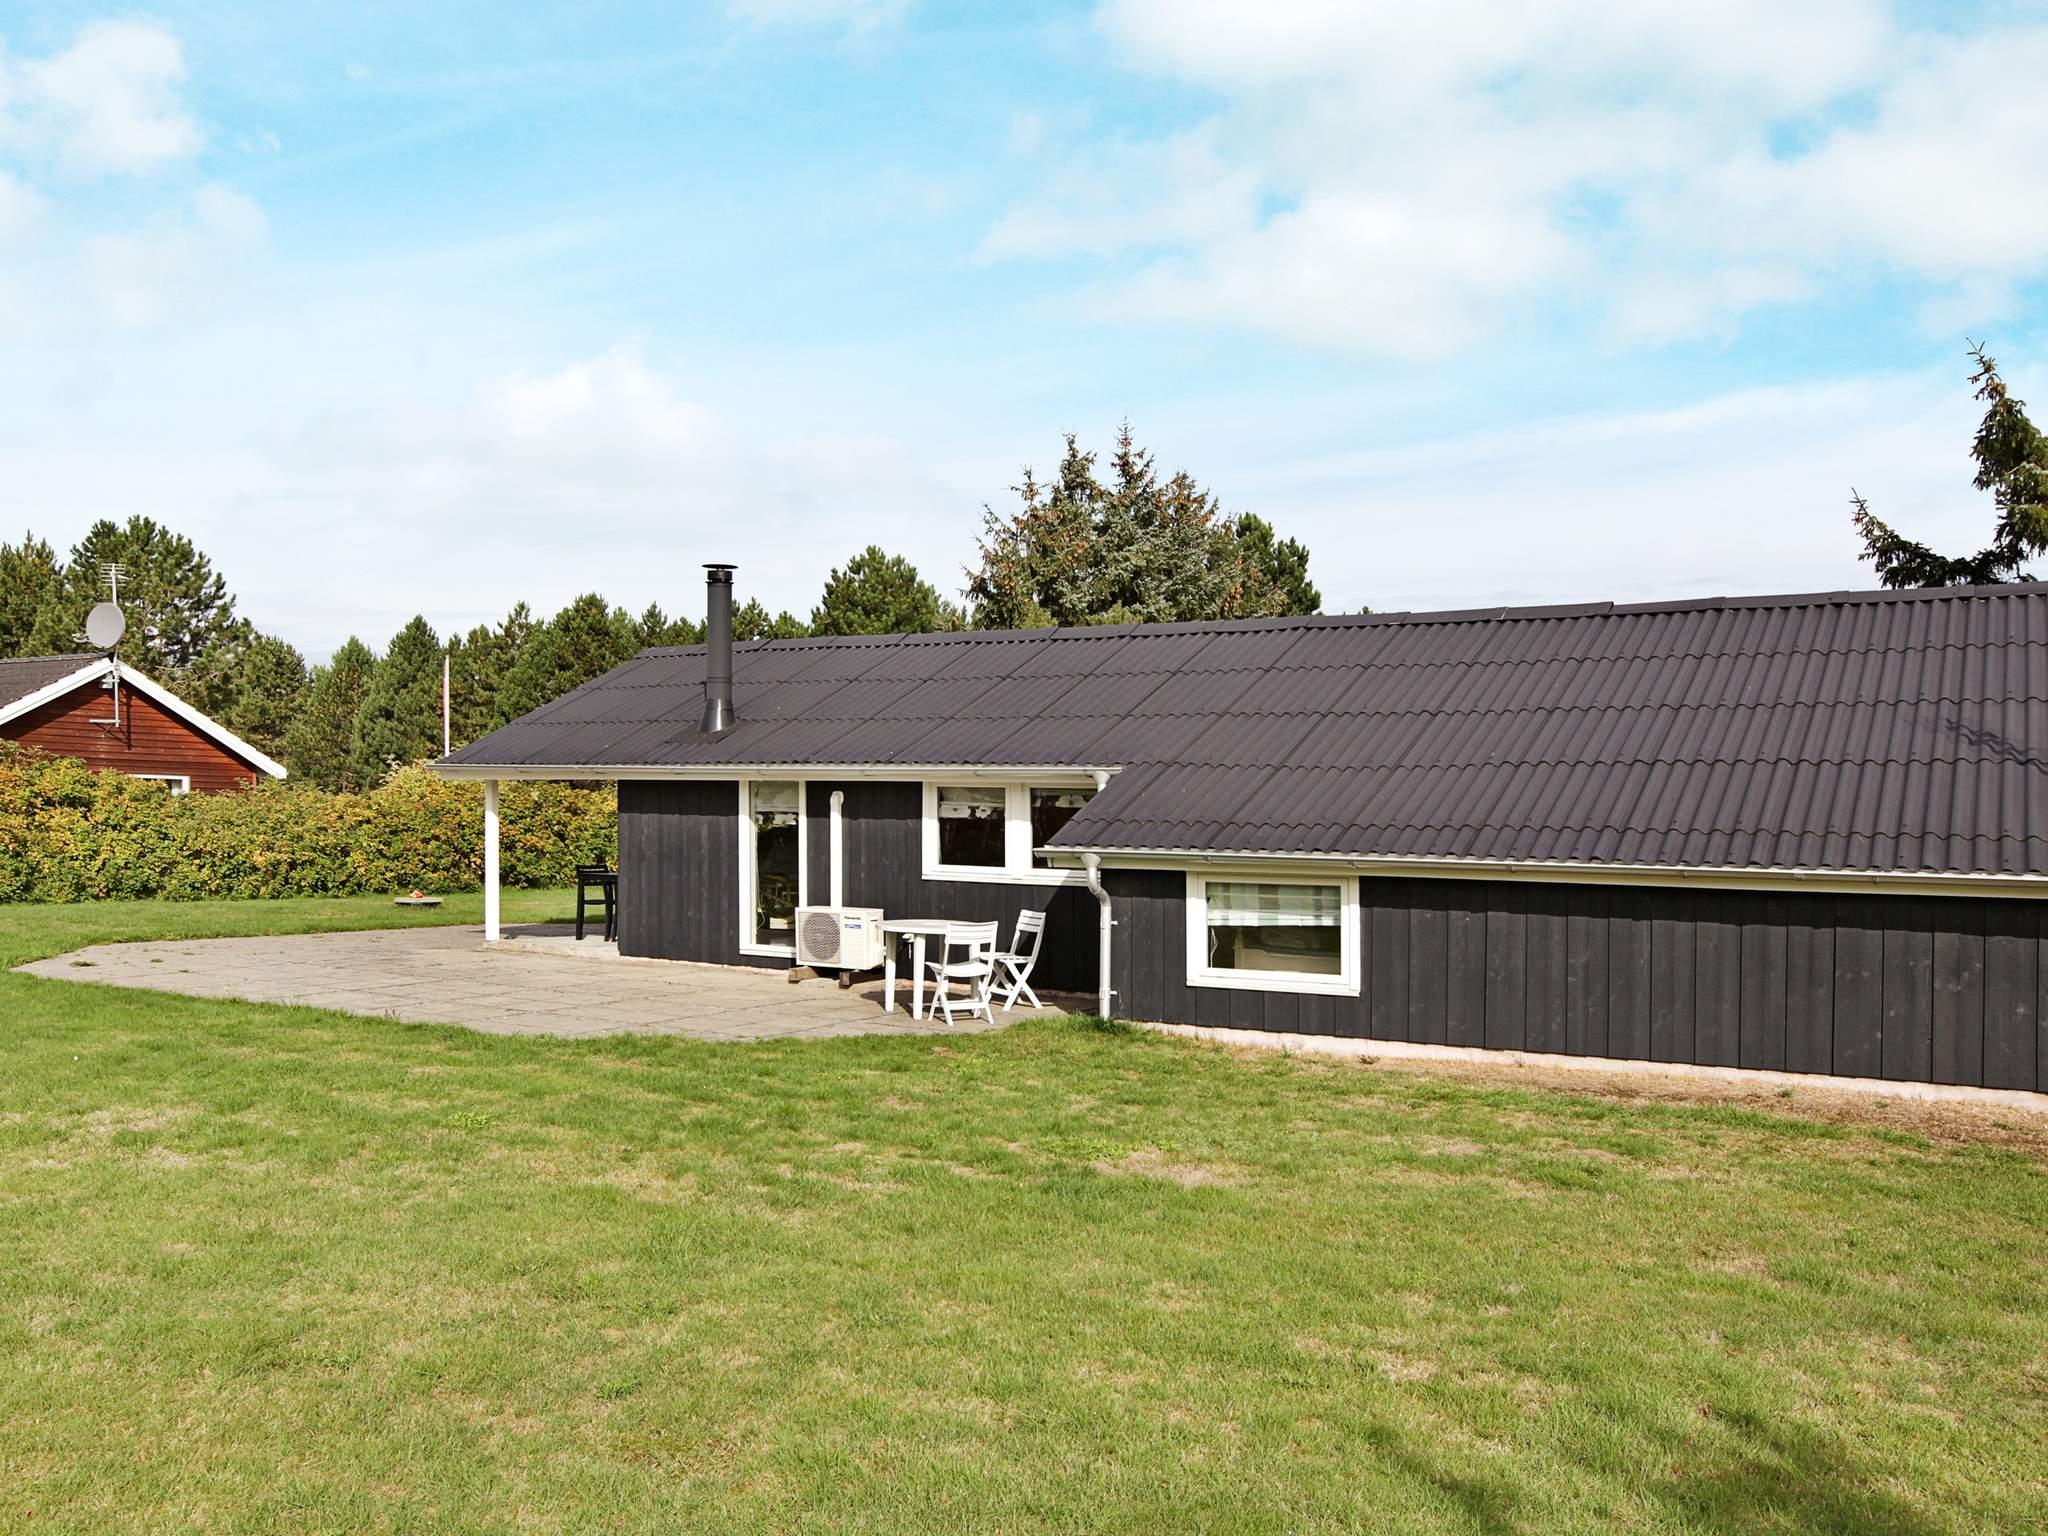 Maison de vacances Kramnitze (87258), Kramnitse, , Lolland, Danemark, image 13